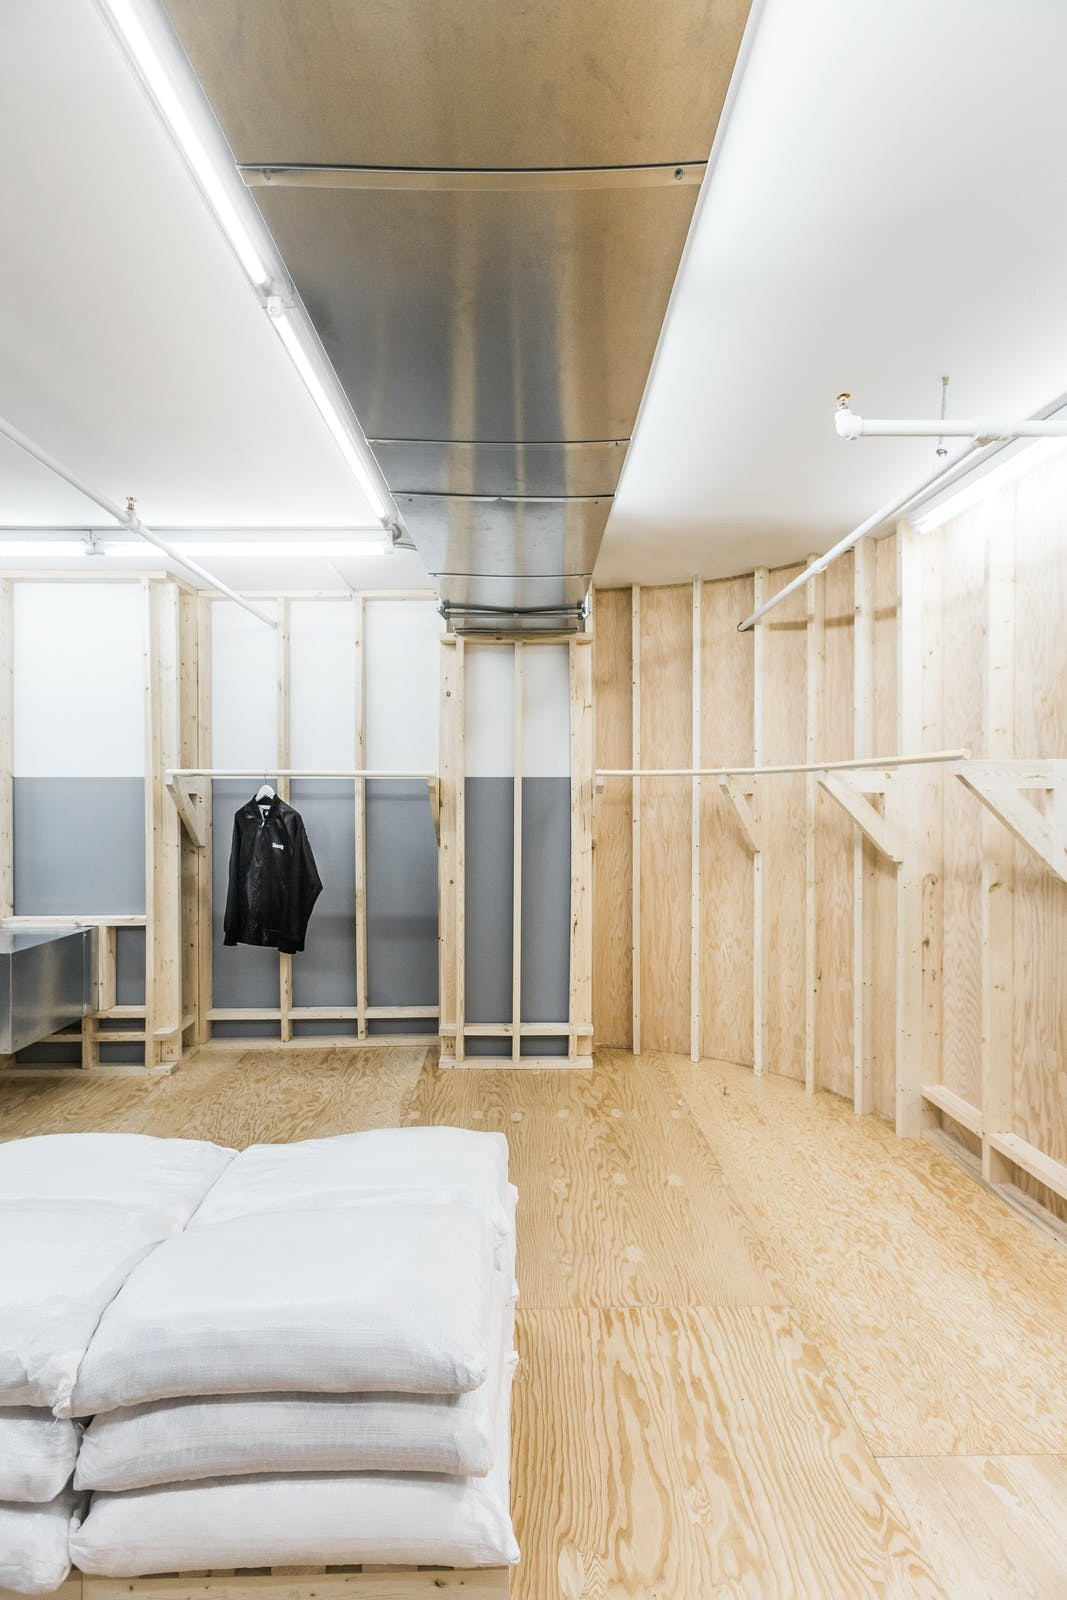 独家对话,Perron-Roettinger 打造的 Stüssy Shibuya 店铺即将开幕